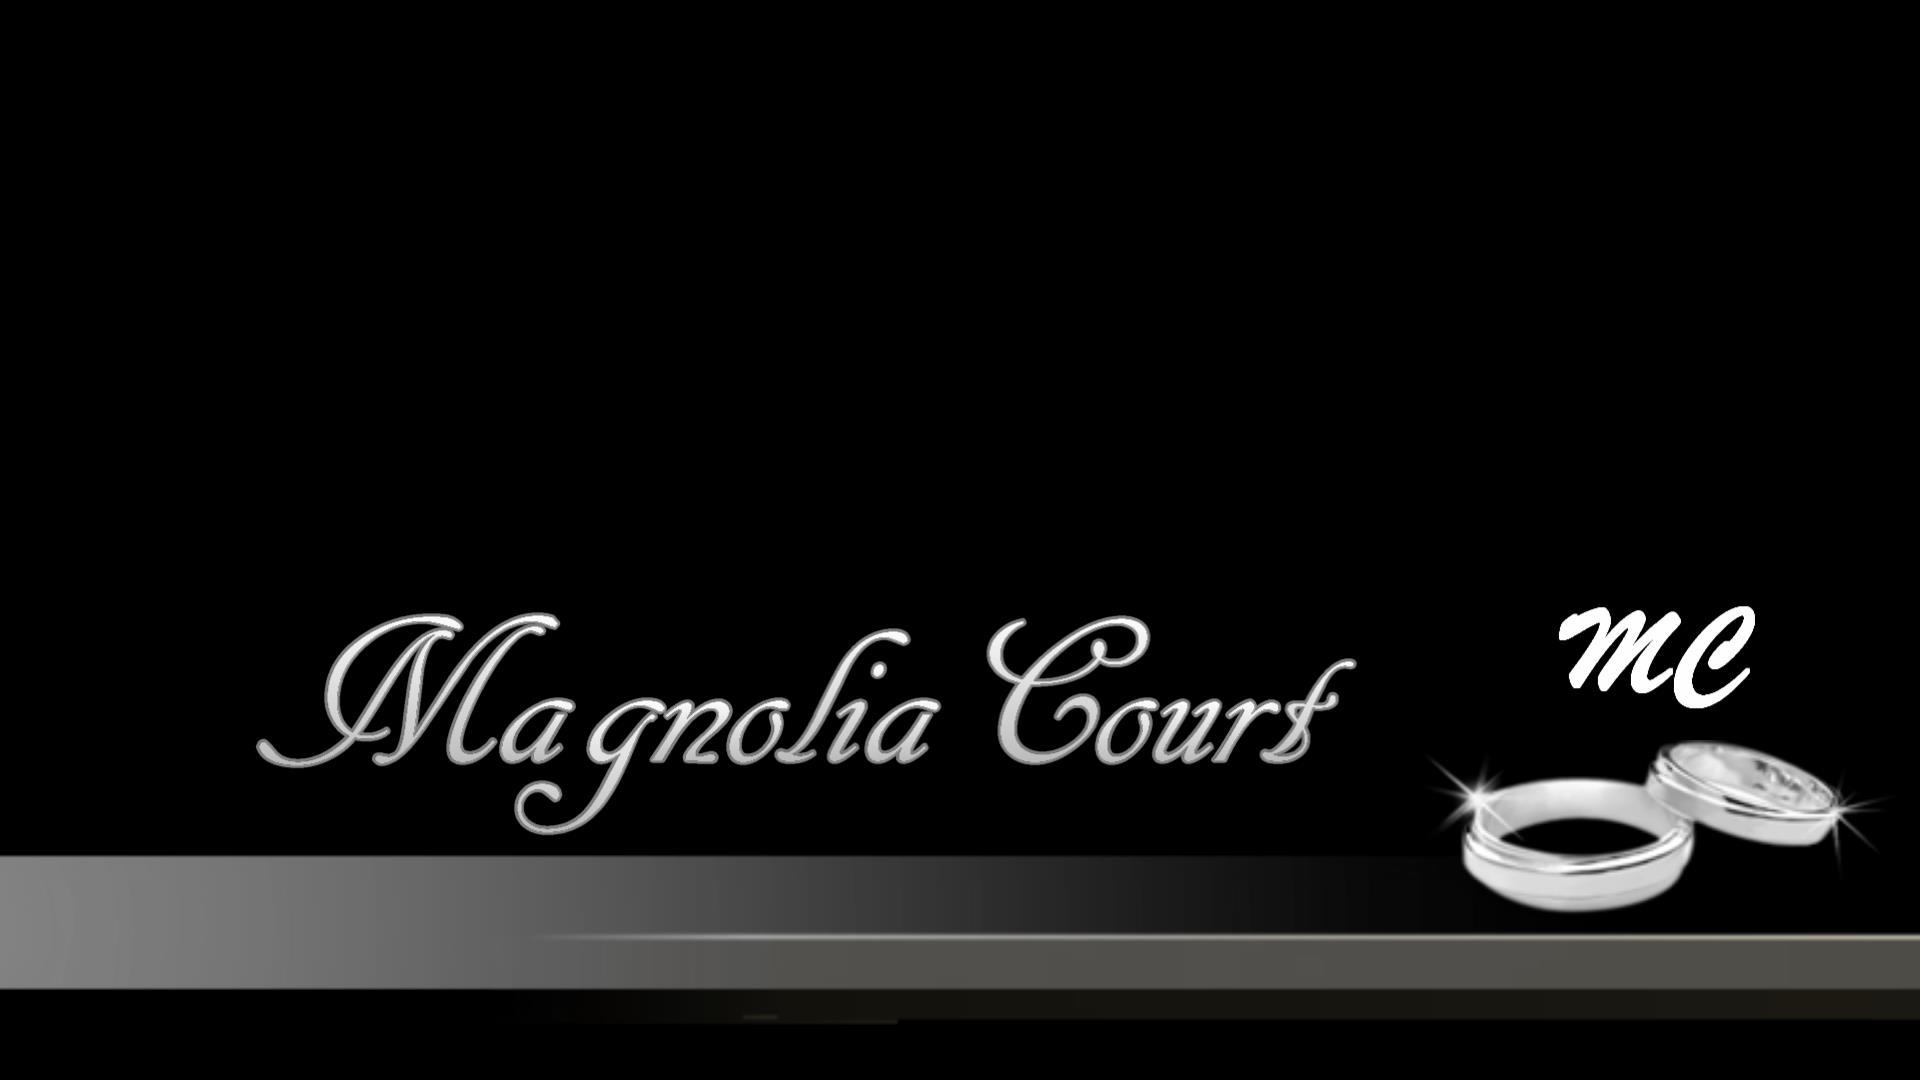 Magnolia Court Heading and Logo MM